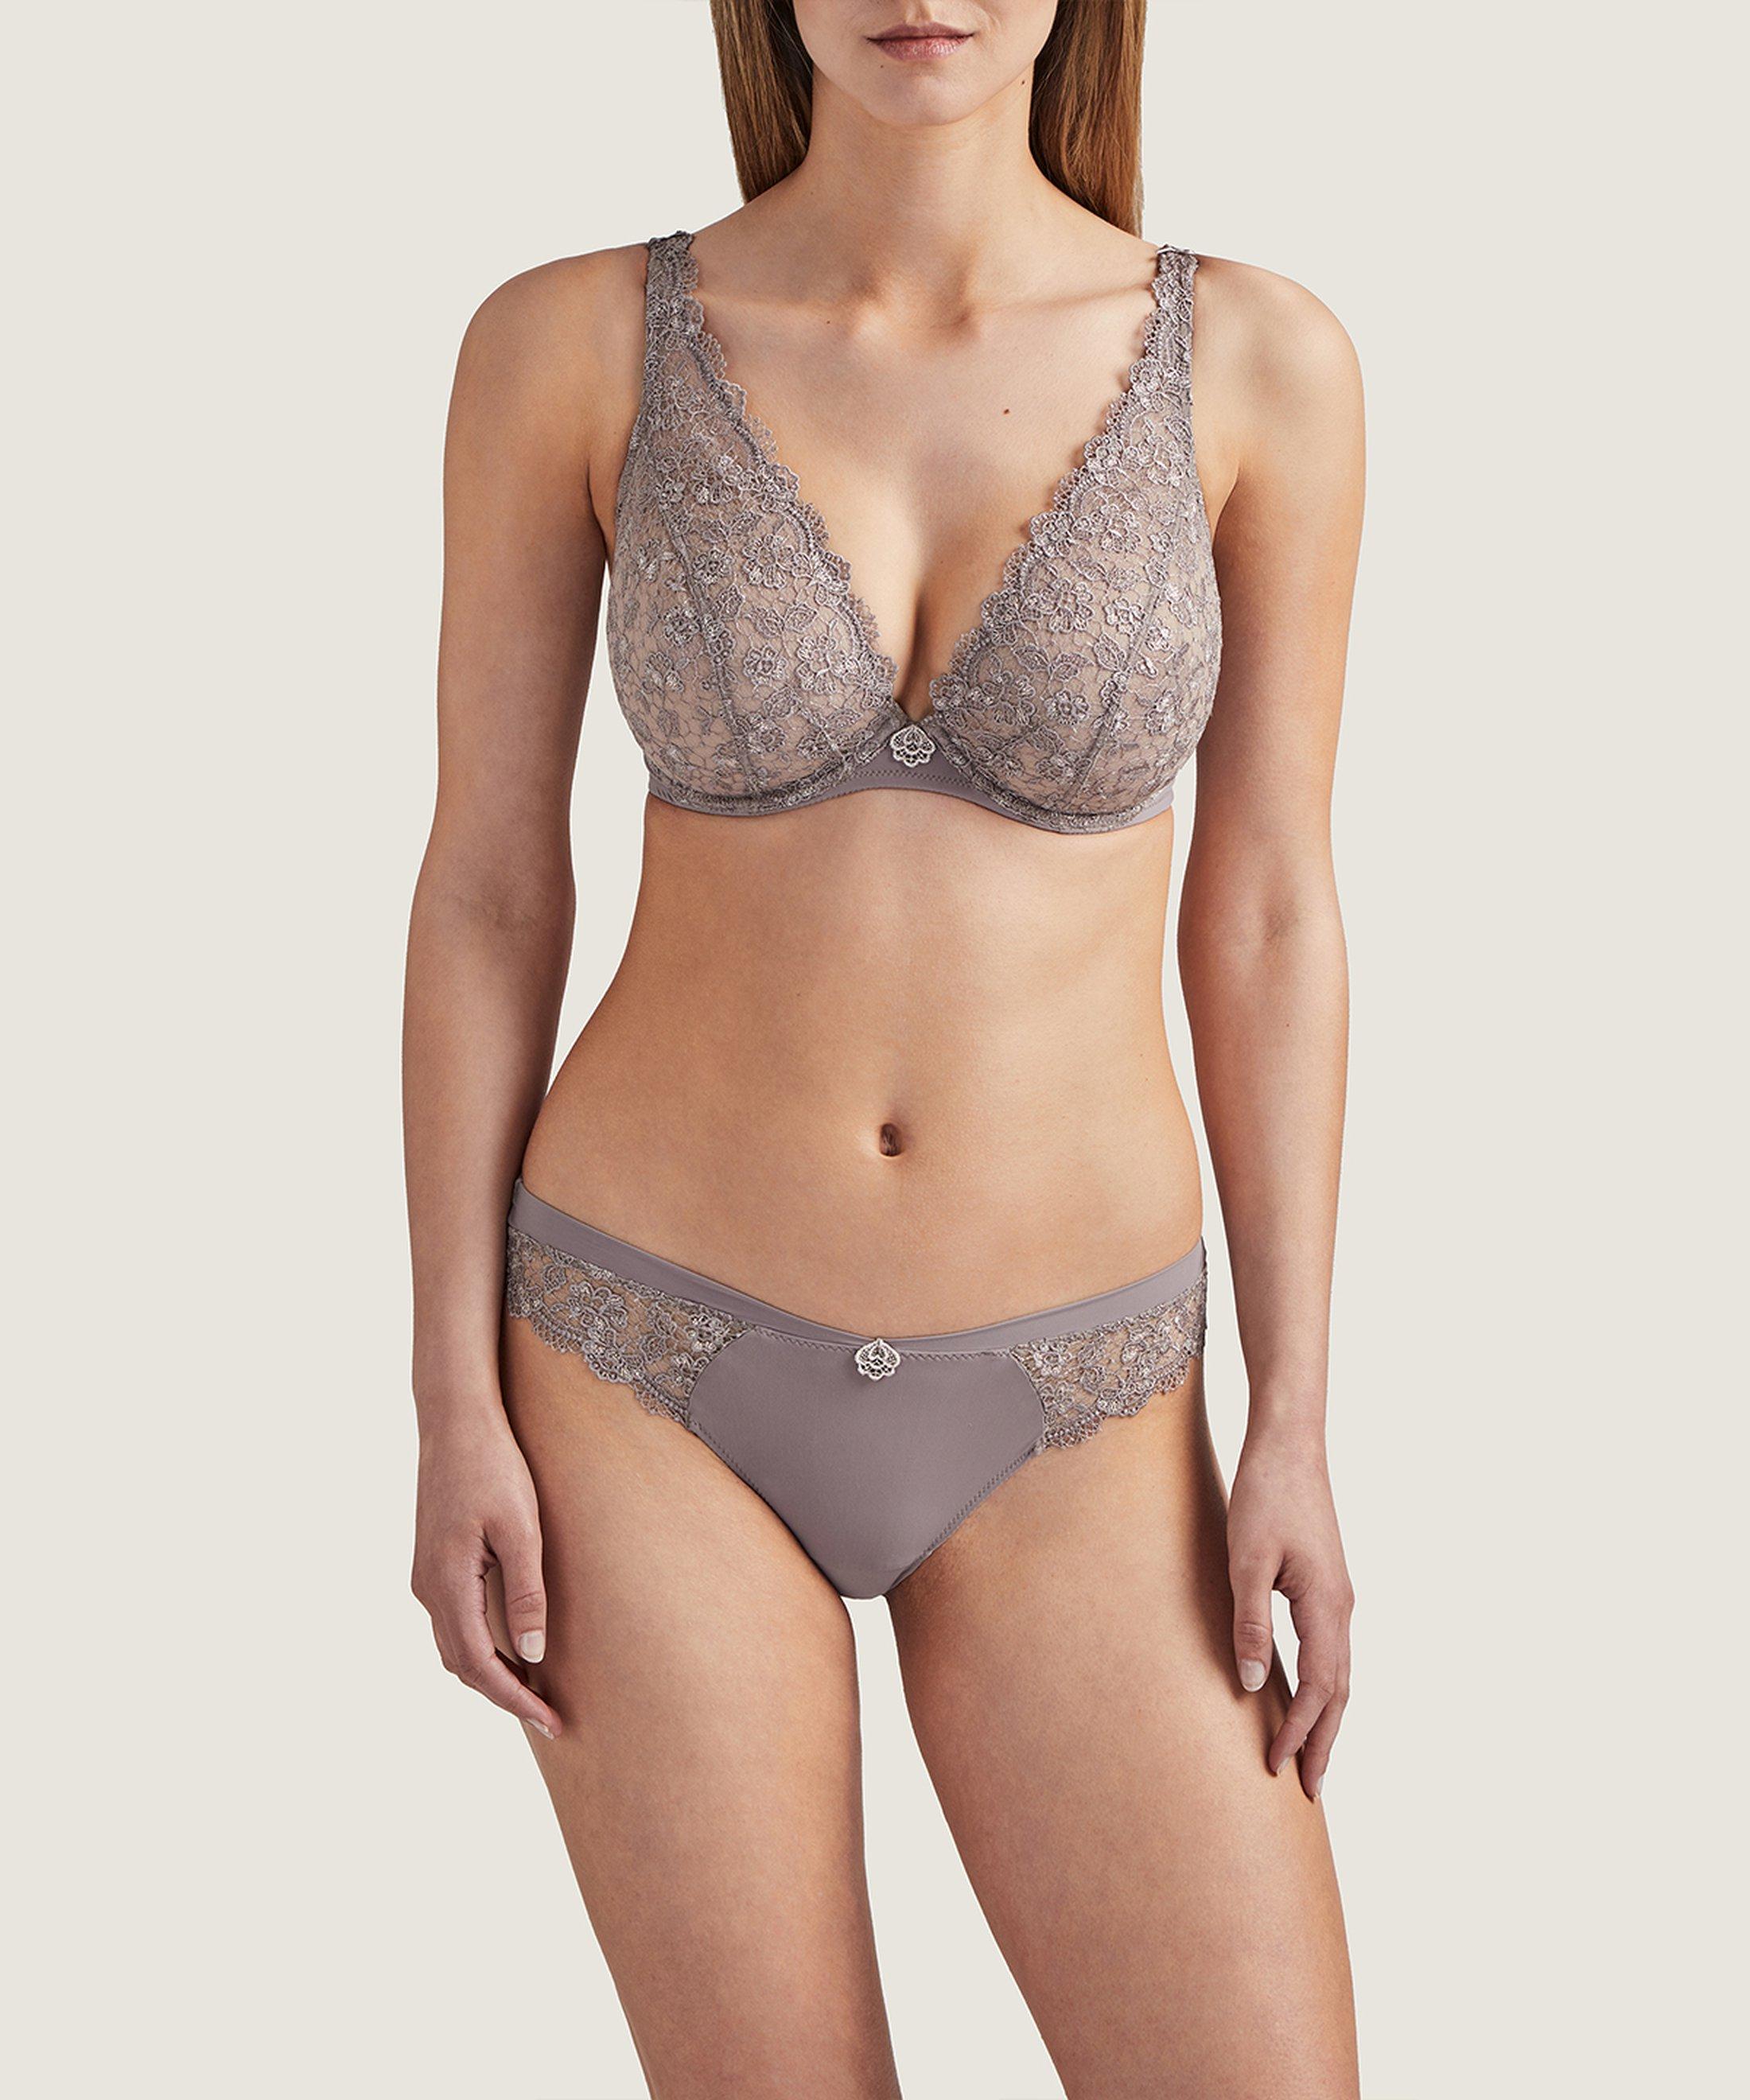 SECRET DE CHARME Comfort triangle plunge bra Mondaine Pink | Aubade